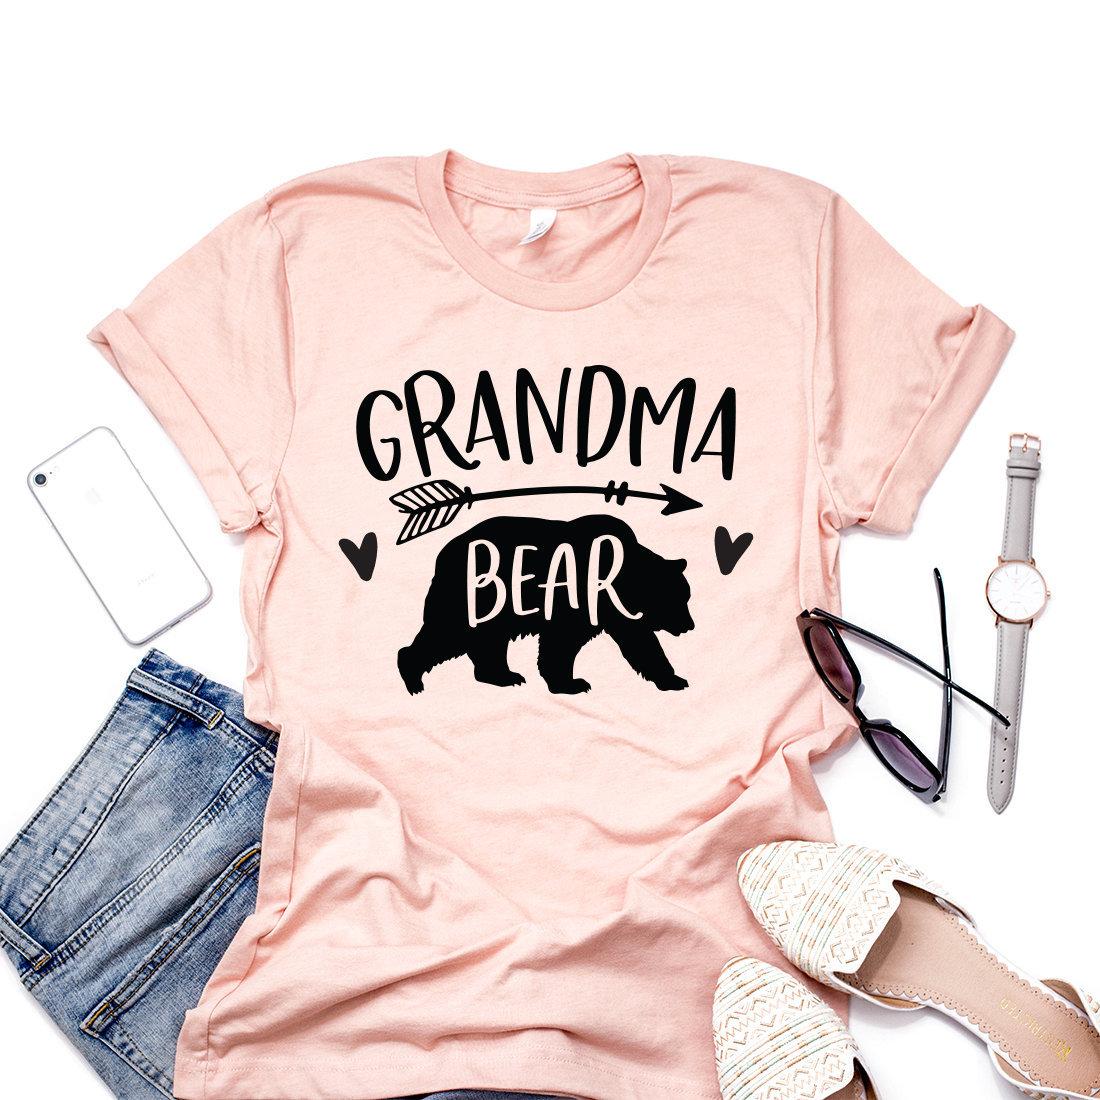 b246df8e4e208 Grandma Bear Shirt Gift For Nana Mothers Day Abuela Shirt | Etsy